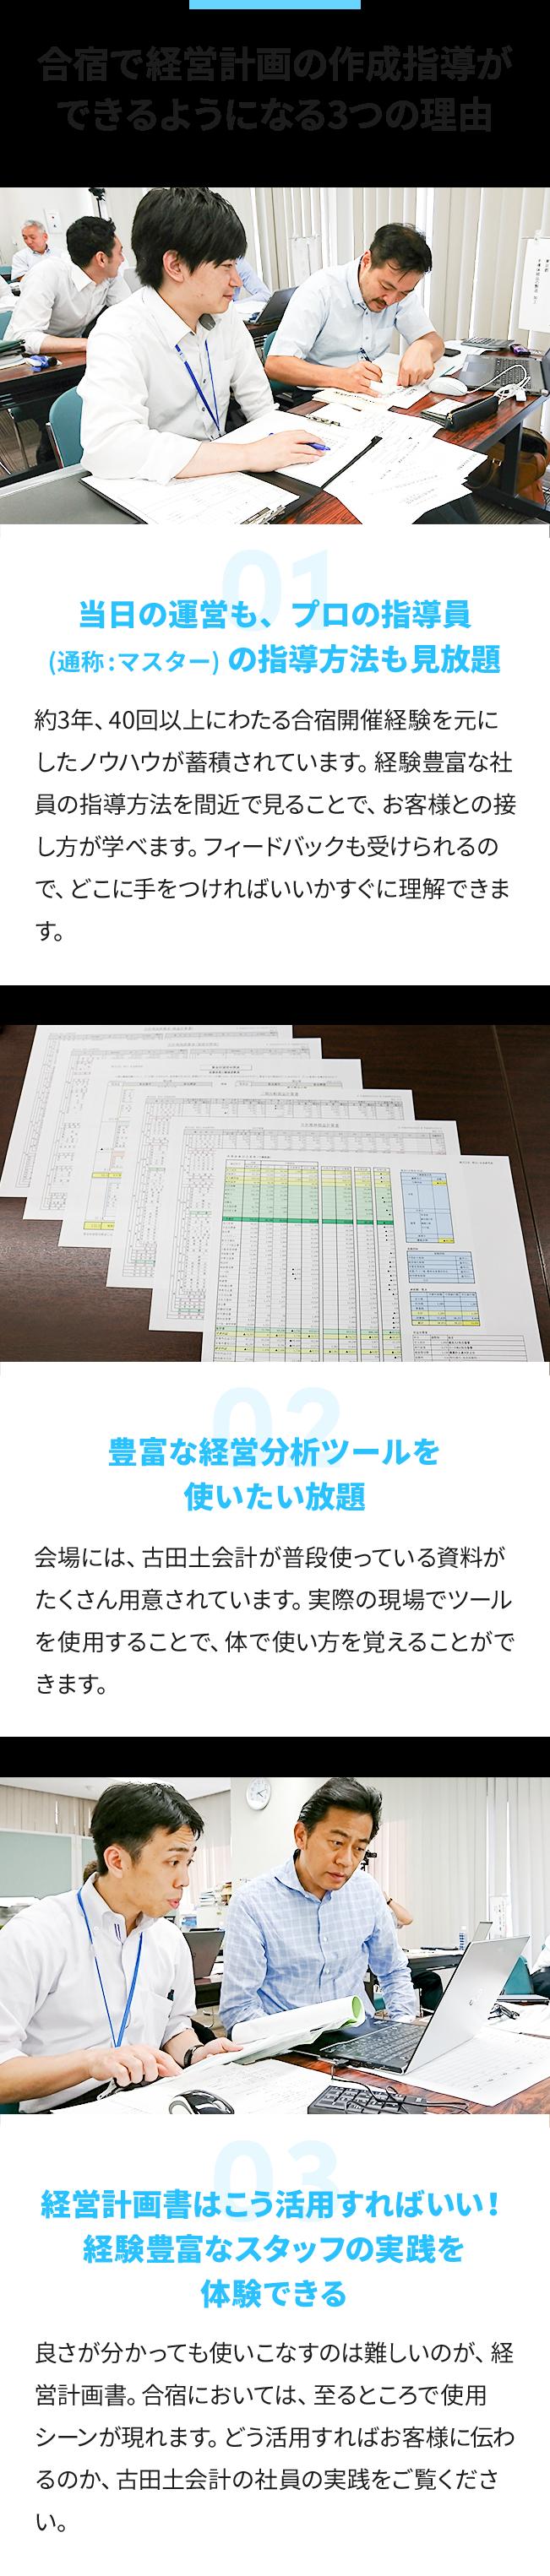 image02_sp